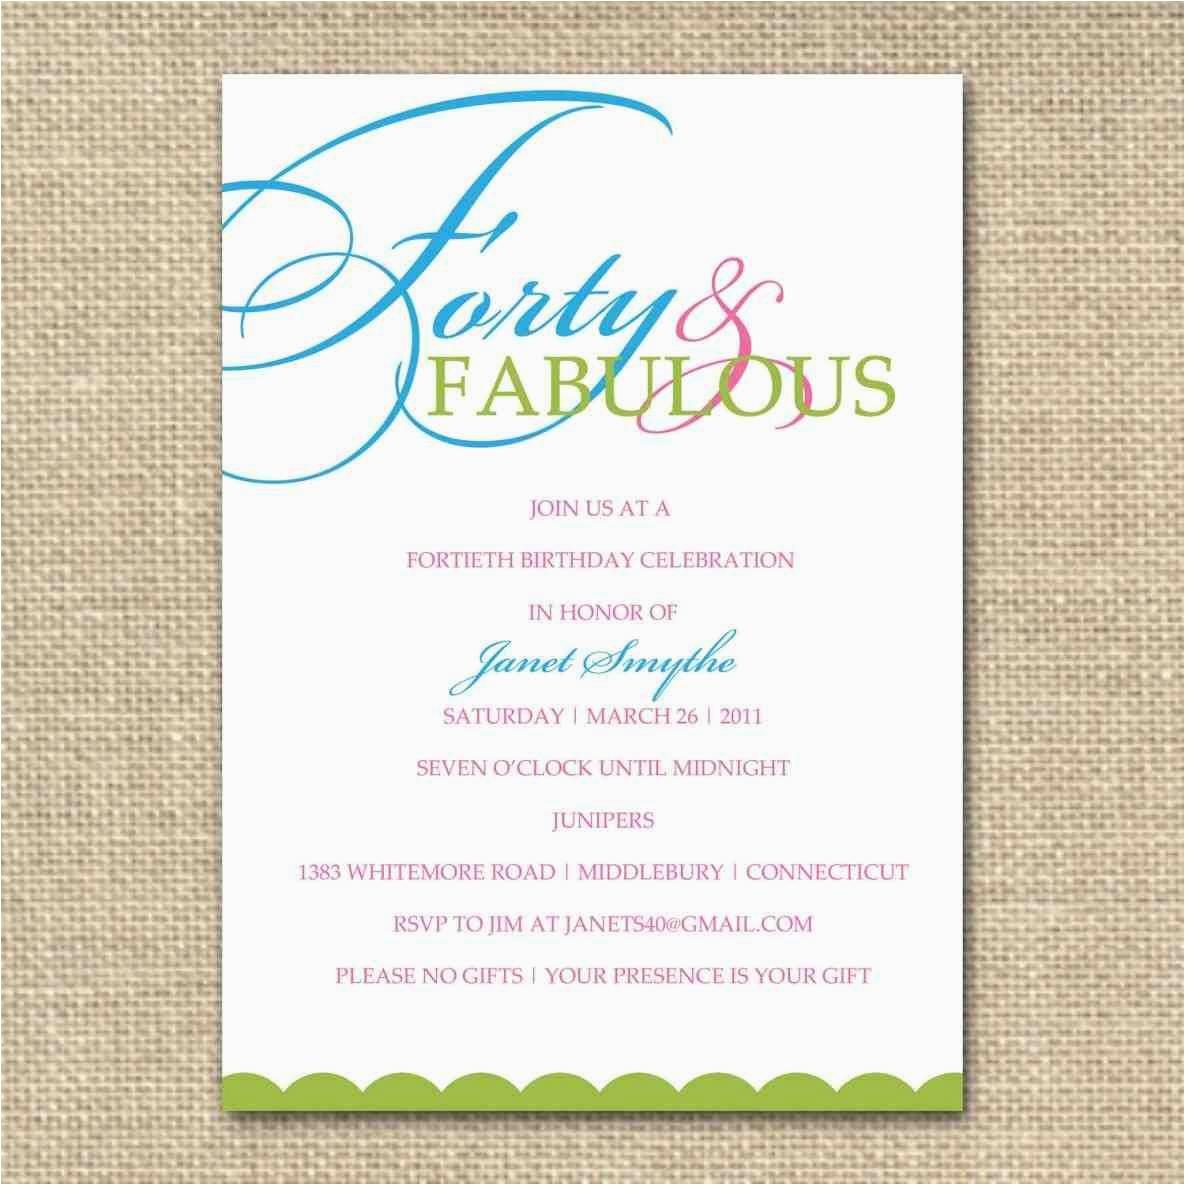 birthday luncheon invitations wording